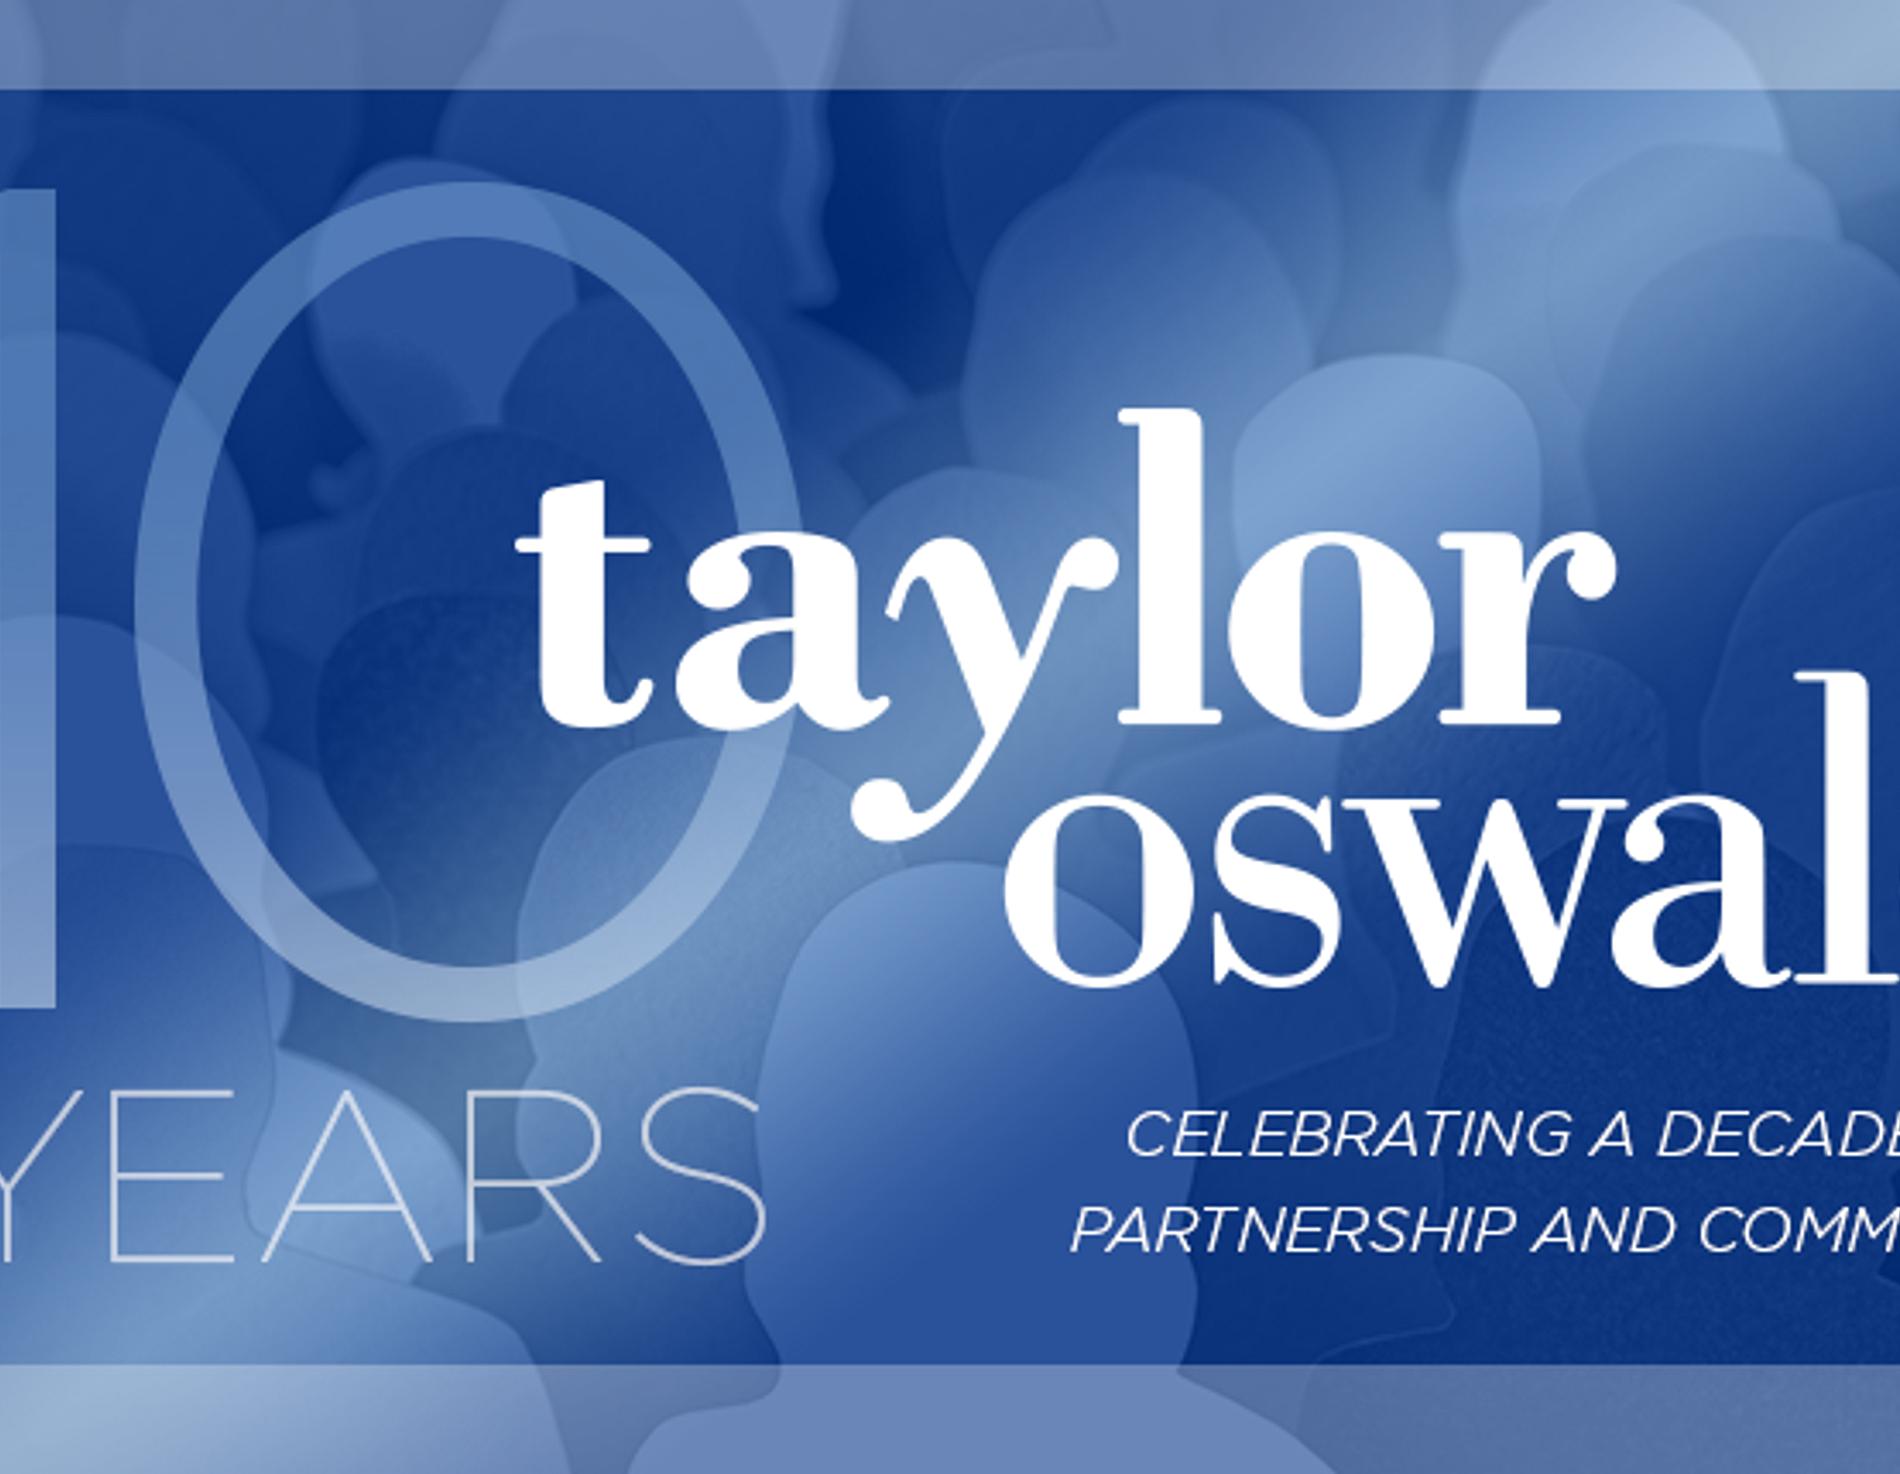 Taylor Oswald Ten Year Anniversary